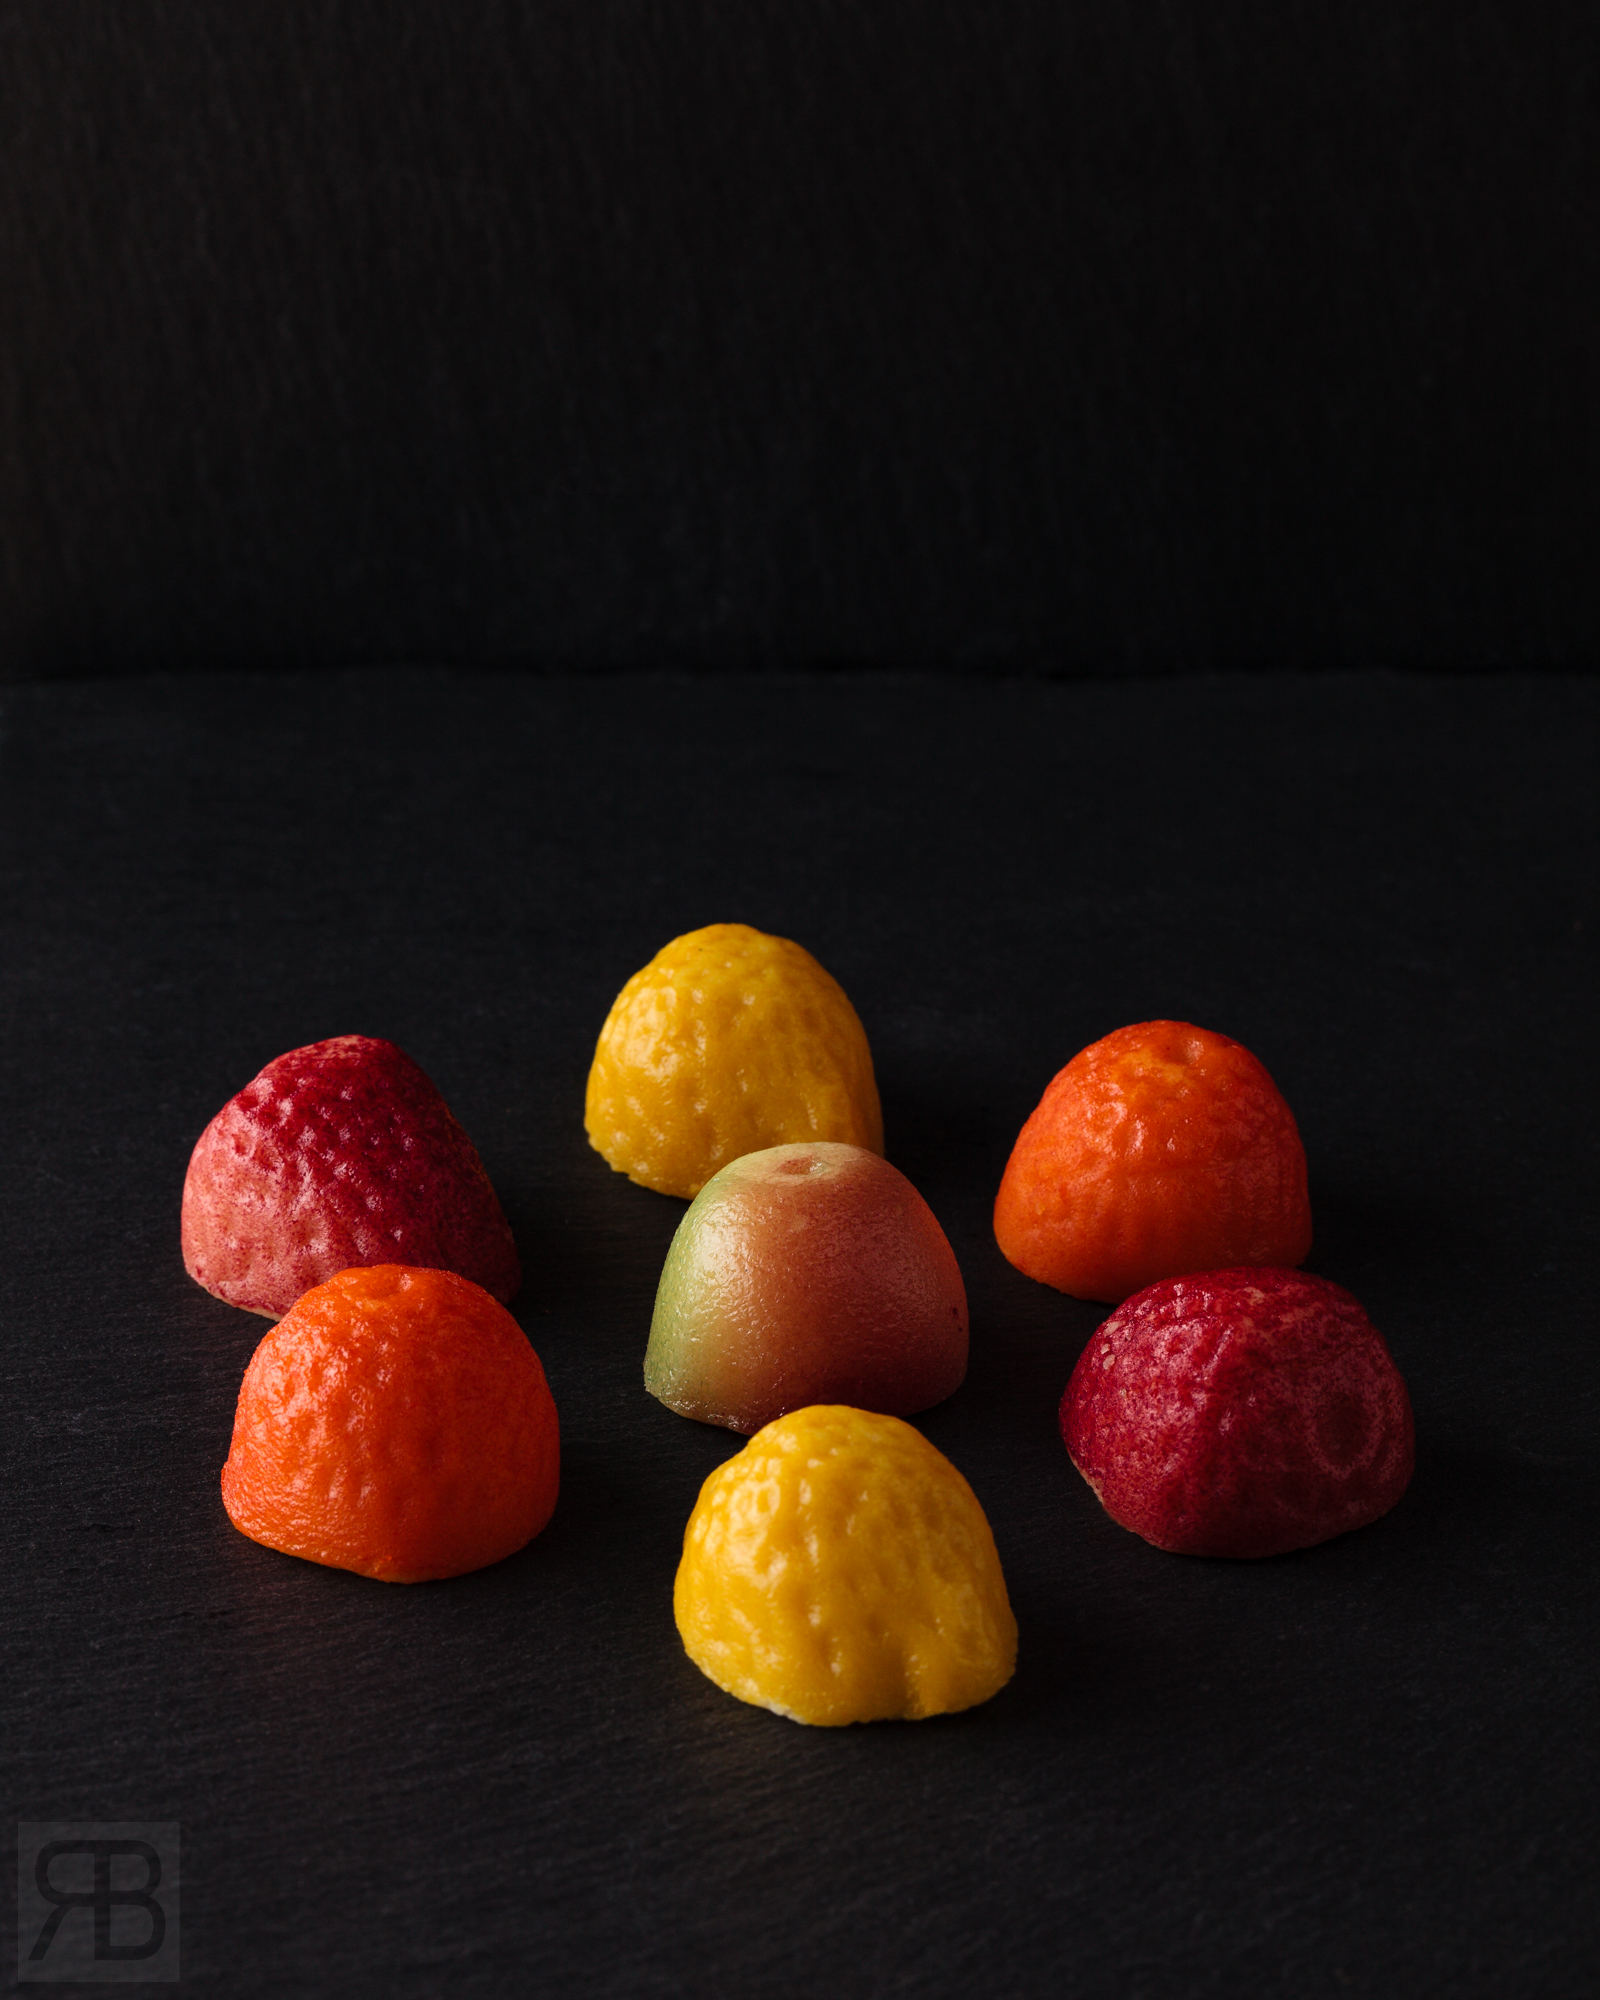 261218_ThorntonsMarzipan_Fruit_24790001-E_WebWM.jpg